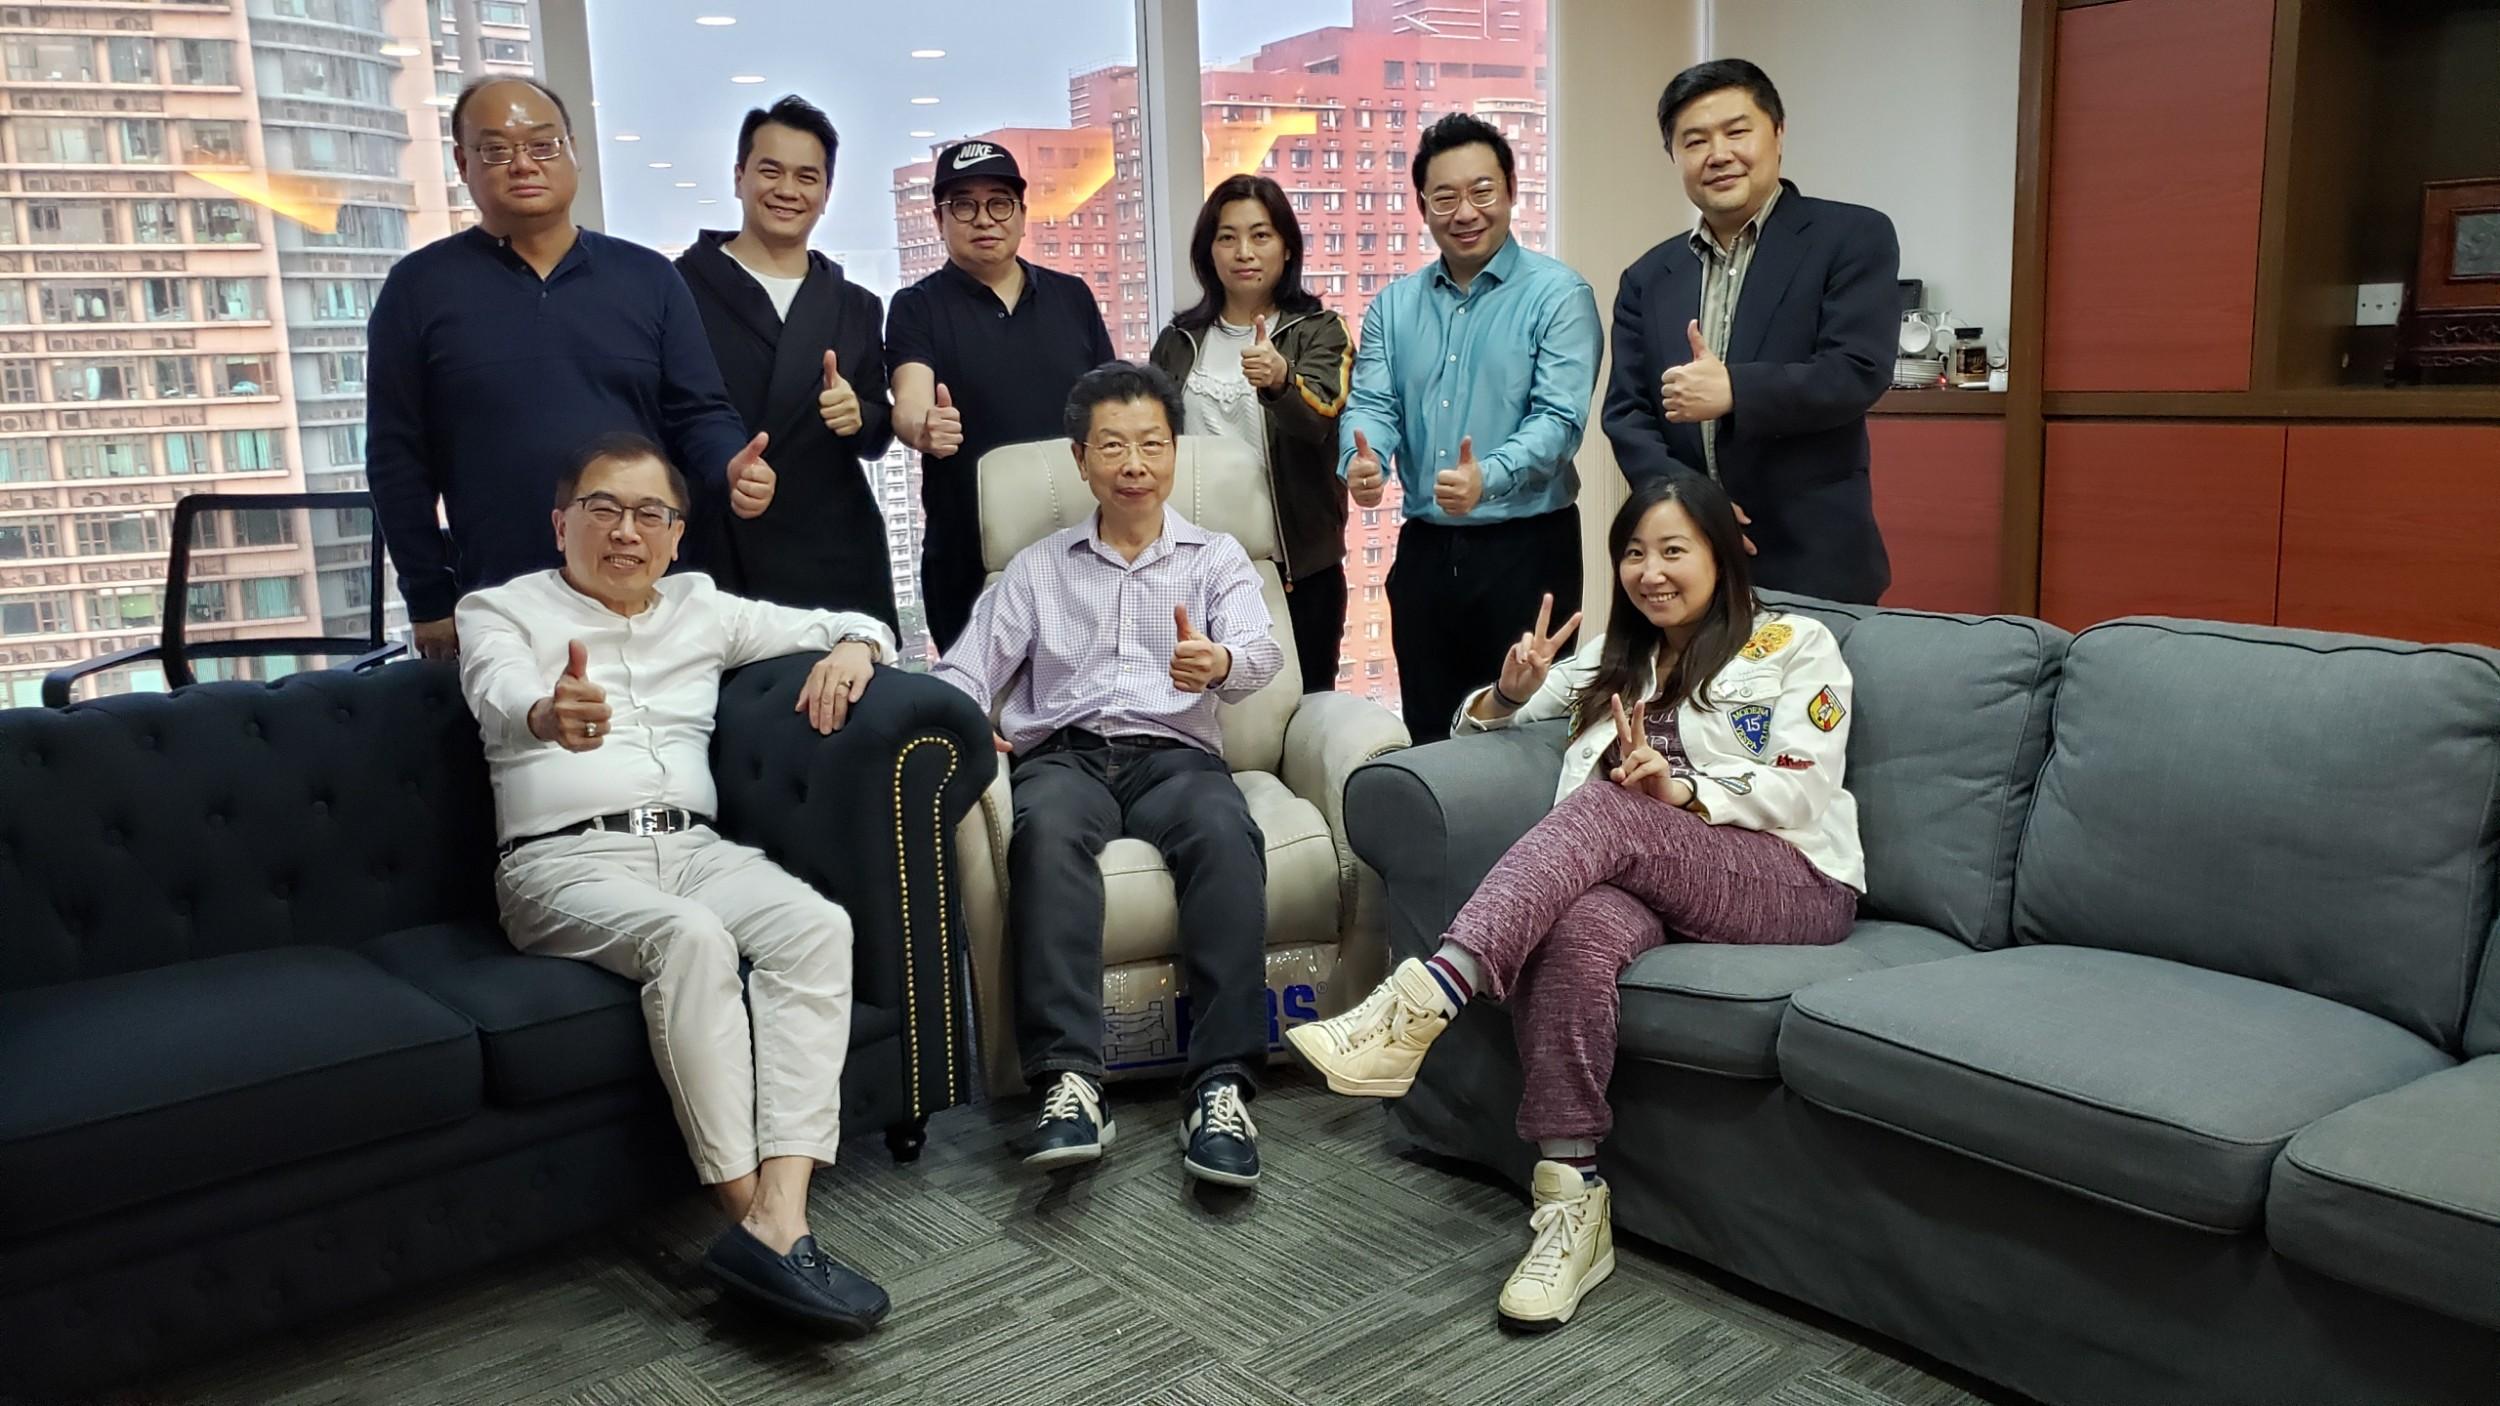 Completion of GLC Company Doctor Program (Mar 2021 Class)